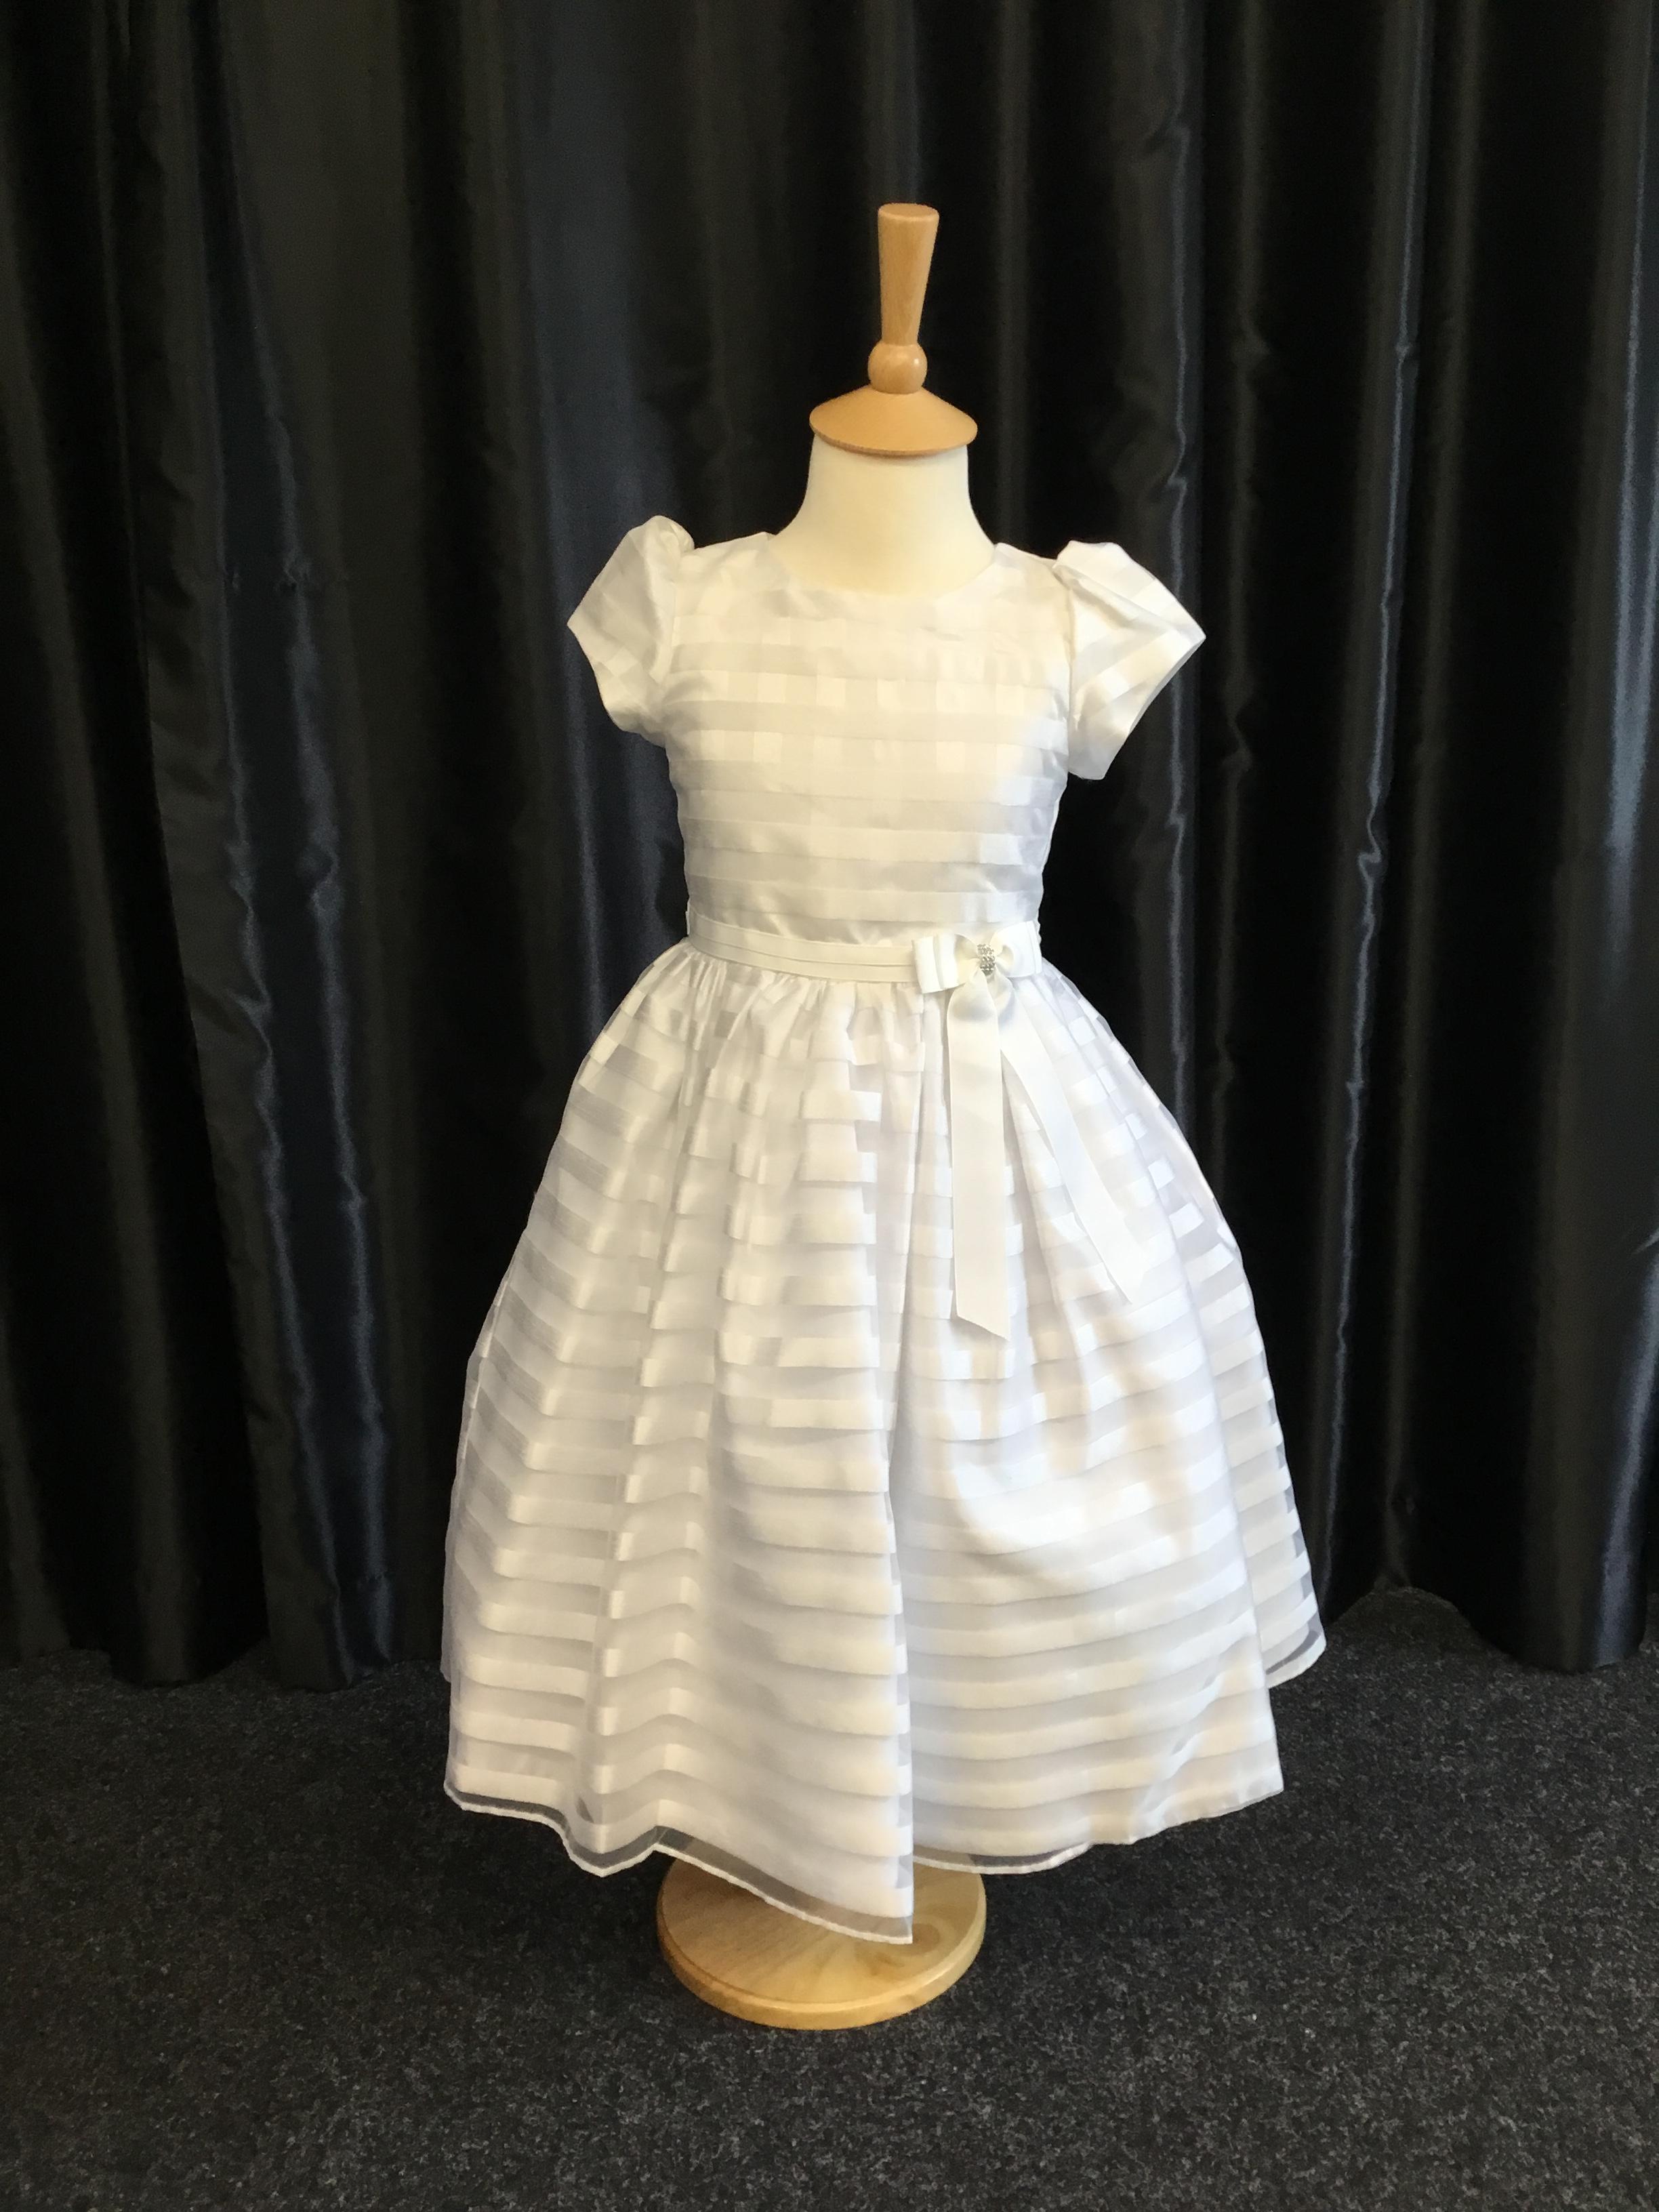 Confirmation Dress